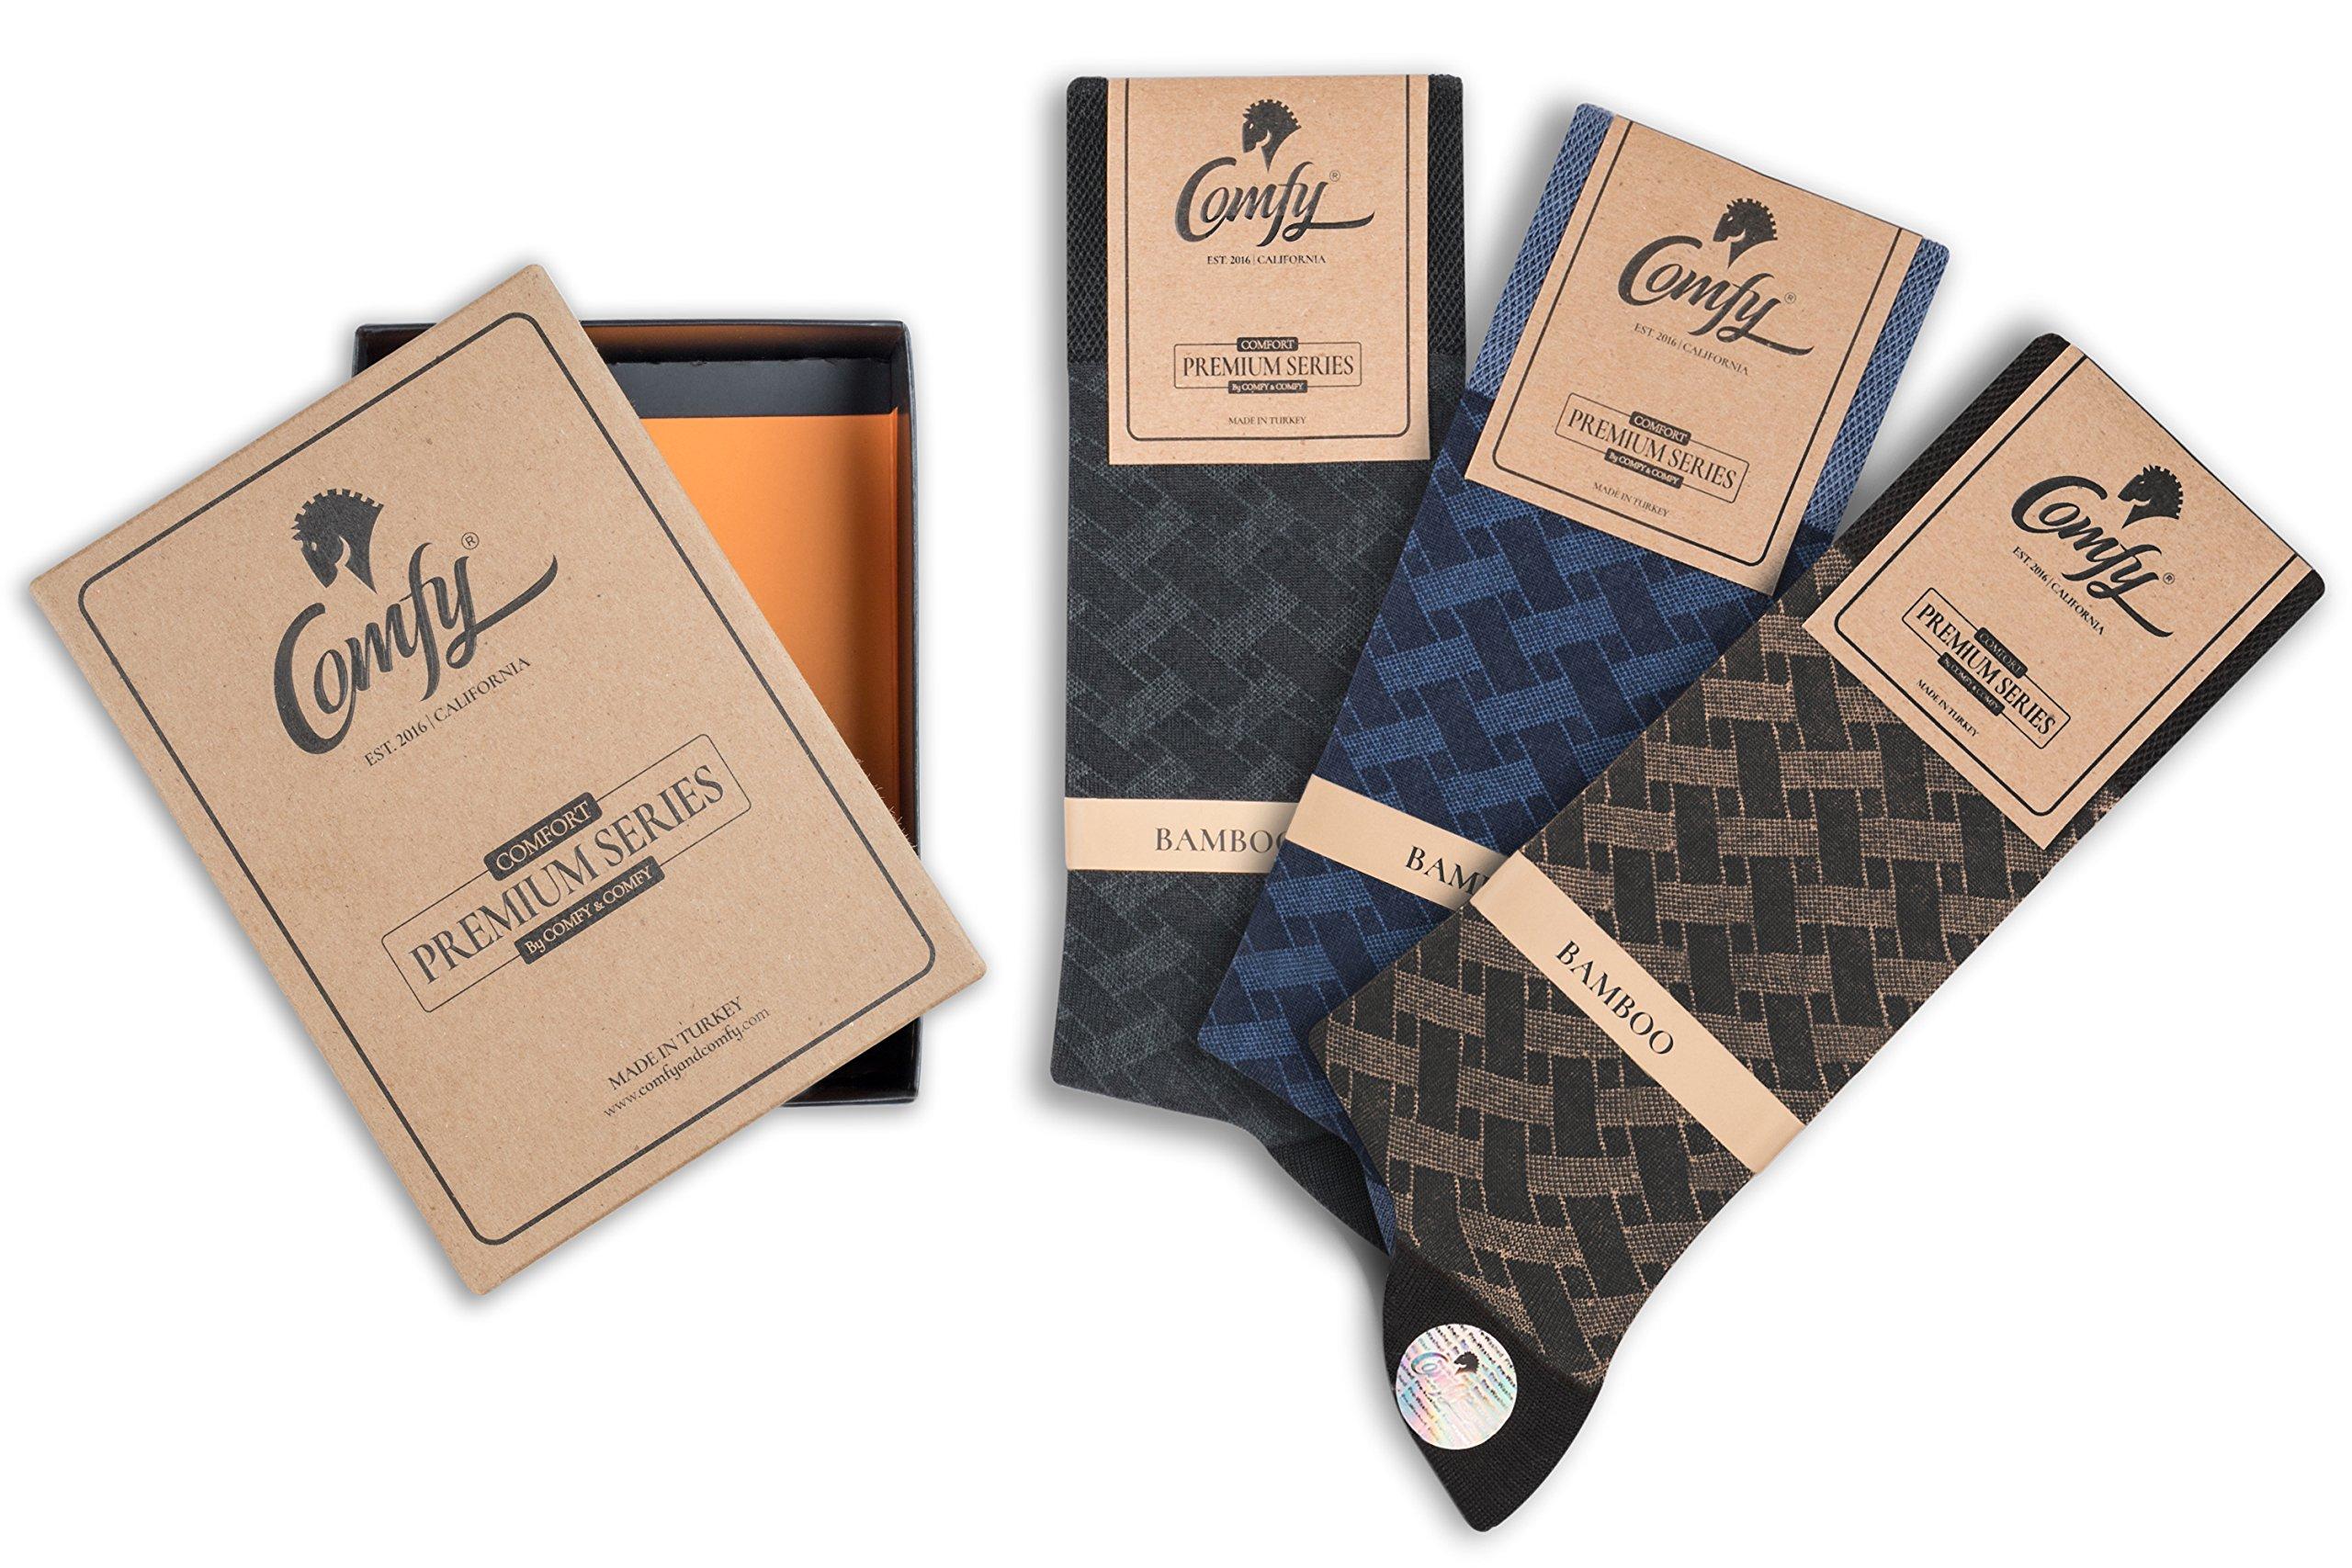 Bamboo Men's Casual Dress & Trouser Socks - 2 pack and 6 Pack -Socks in Gift Box